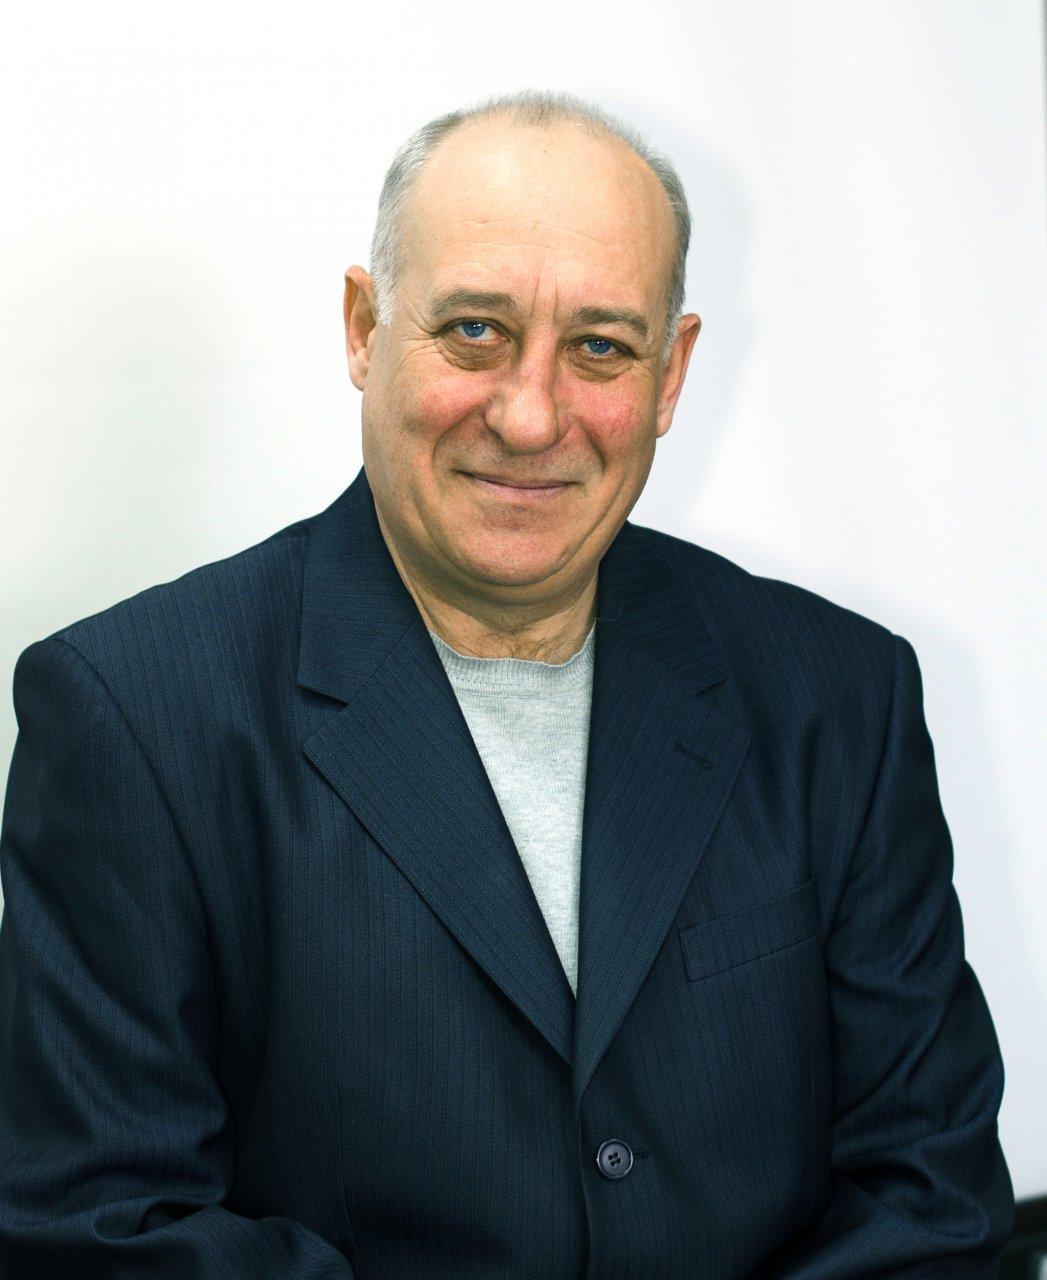 Кутасин Александр Николаевич